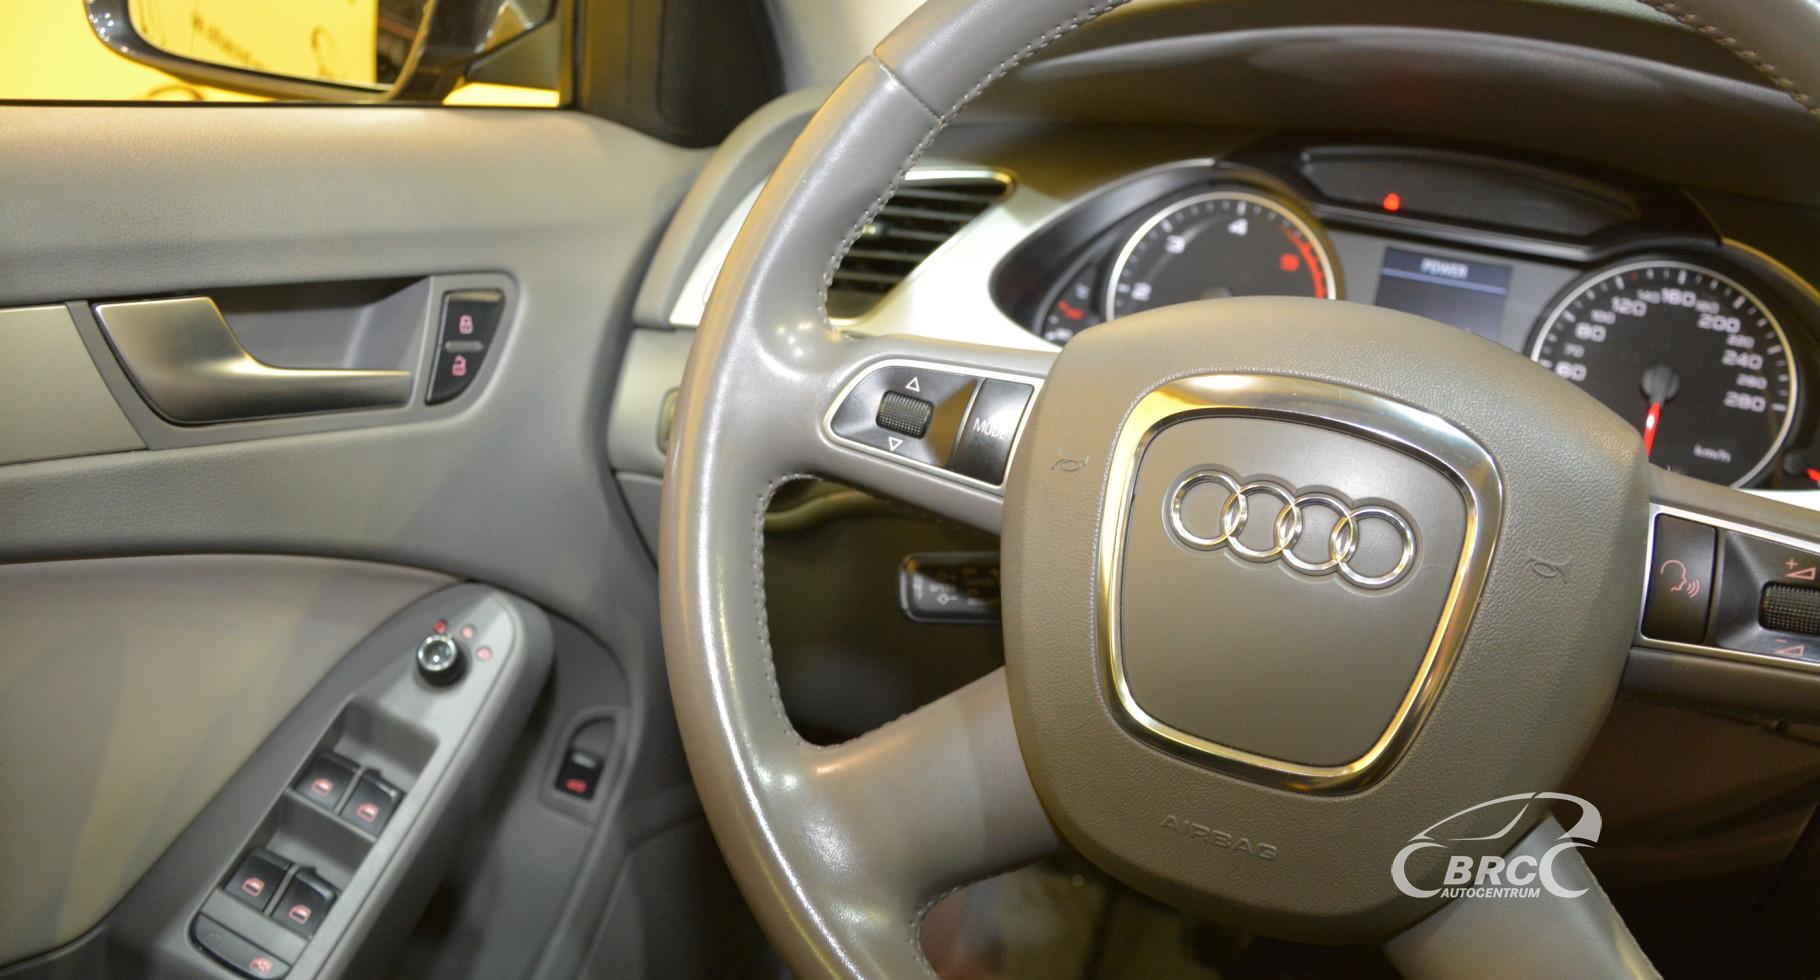 Audi A4 2.7 TDI